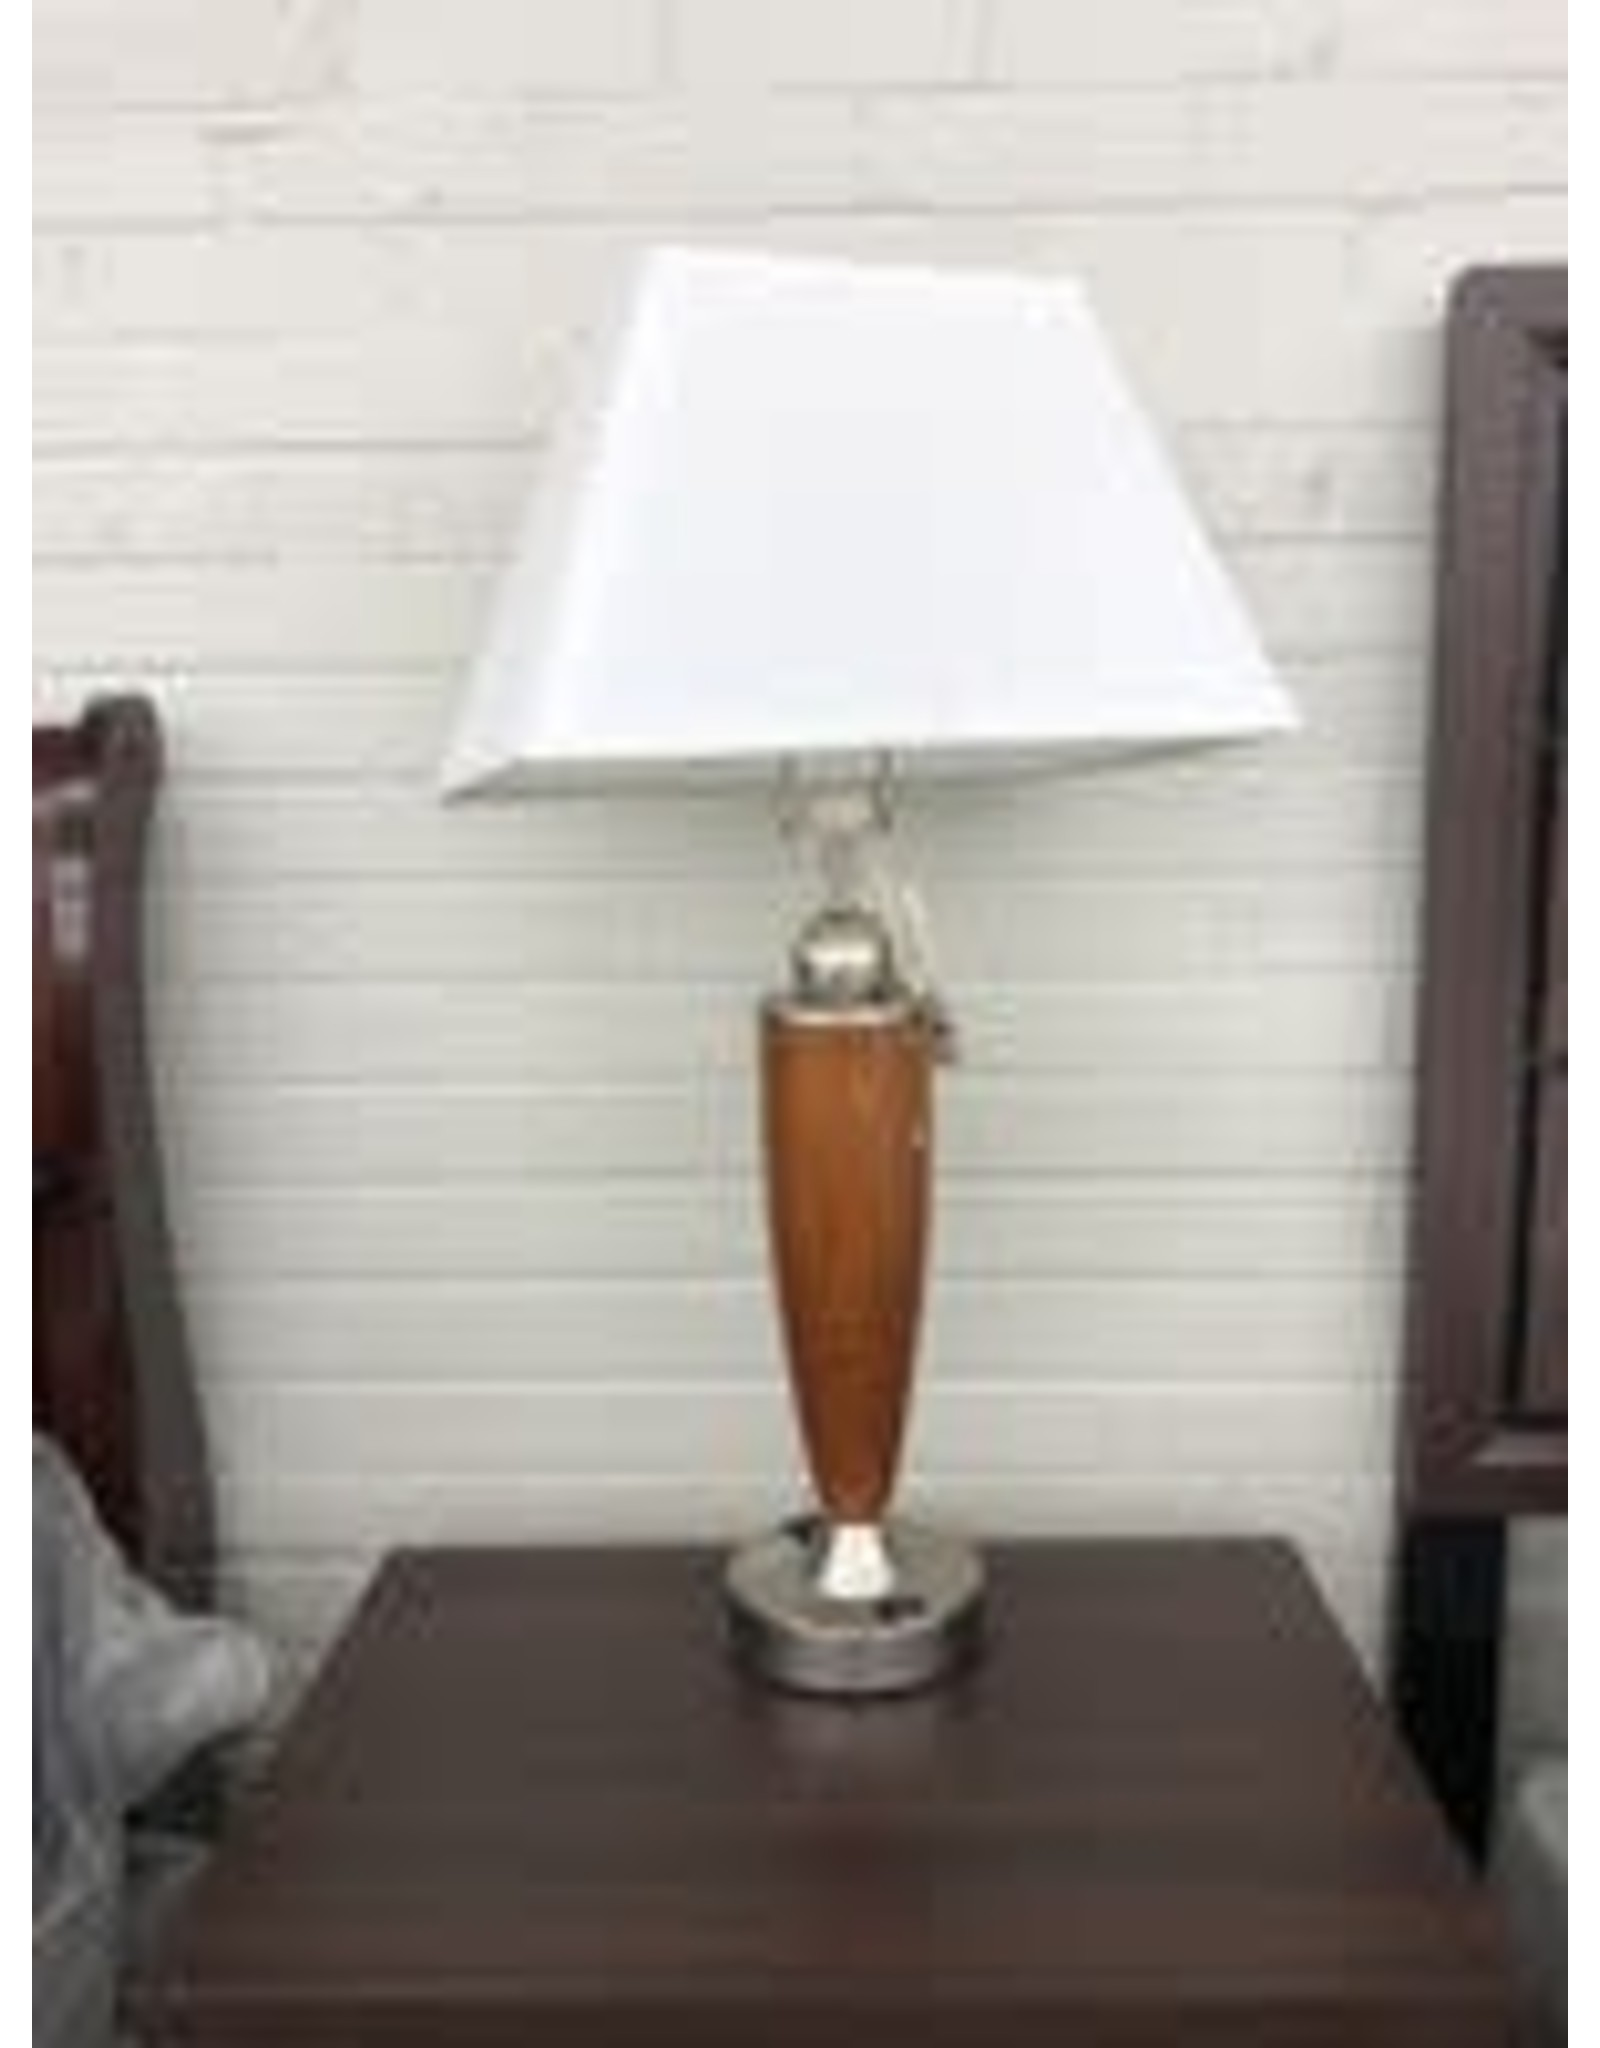 Hilton Garden Inn - Albuquerque HI Lamp TBL wood